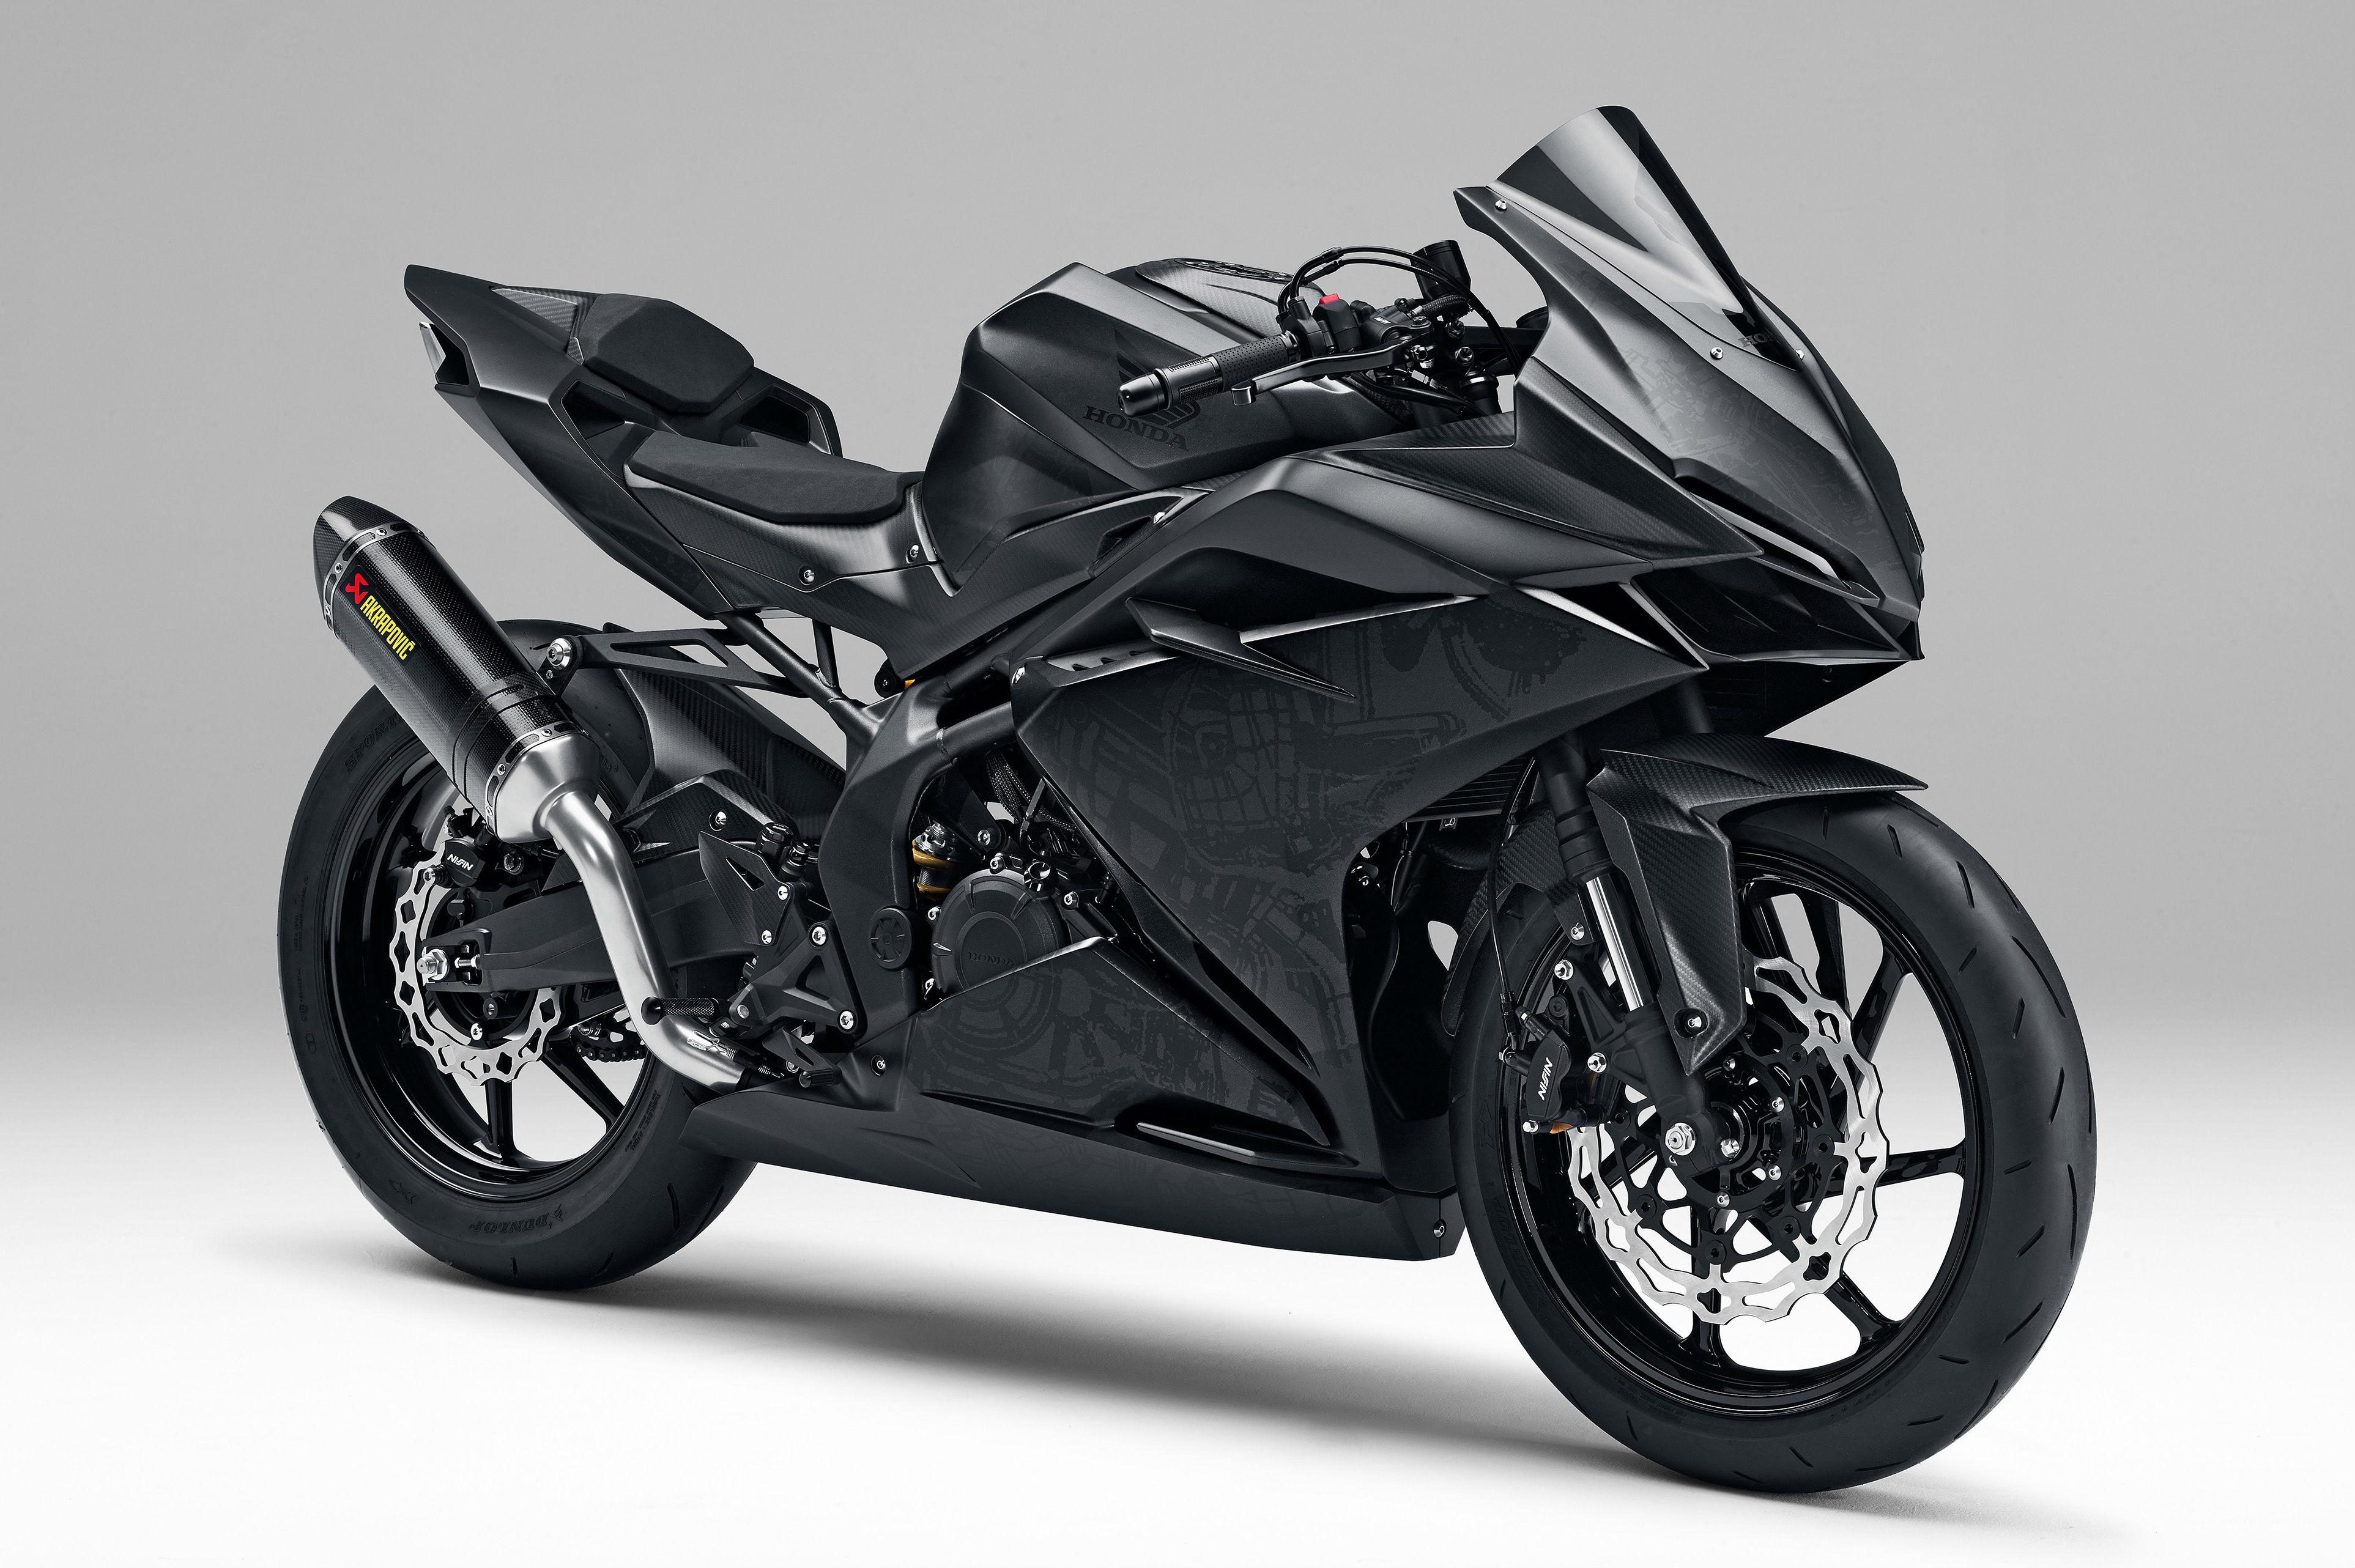 Honda CBR250RR production soon